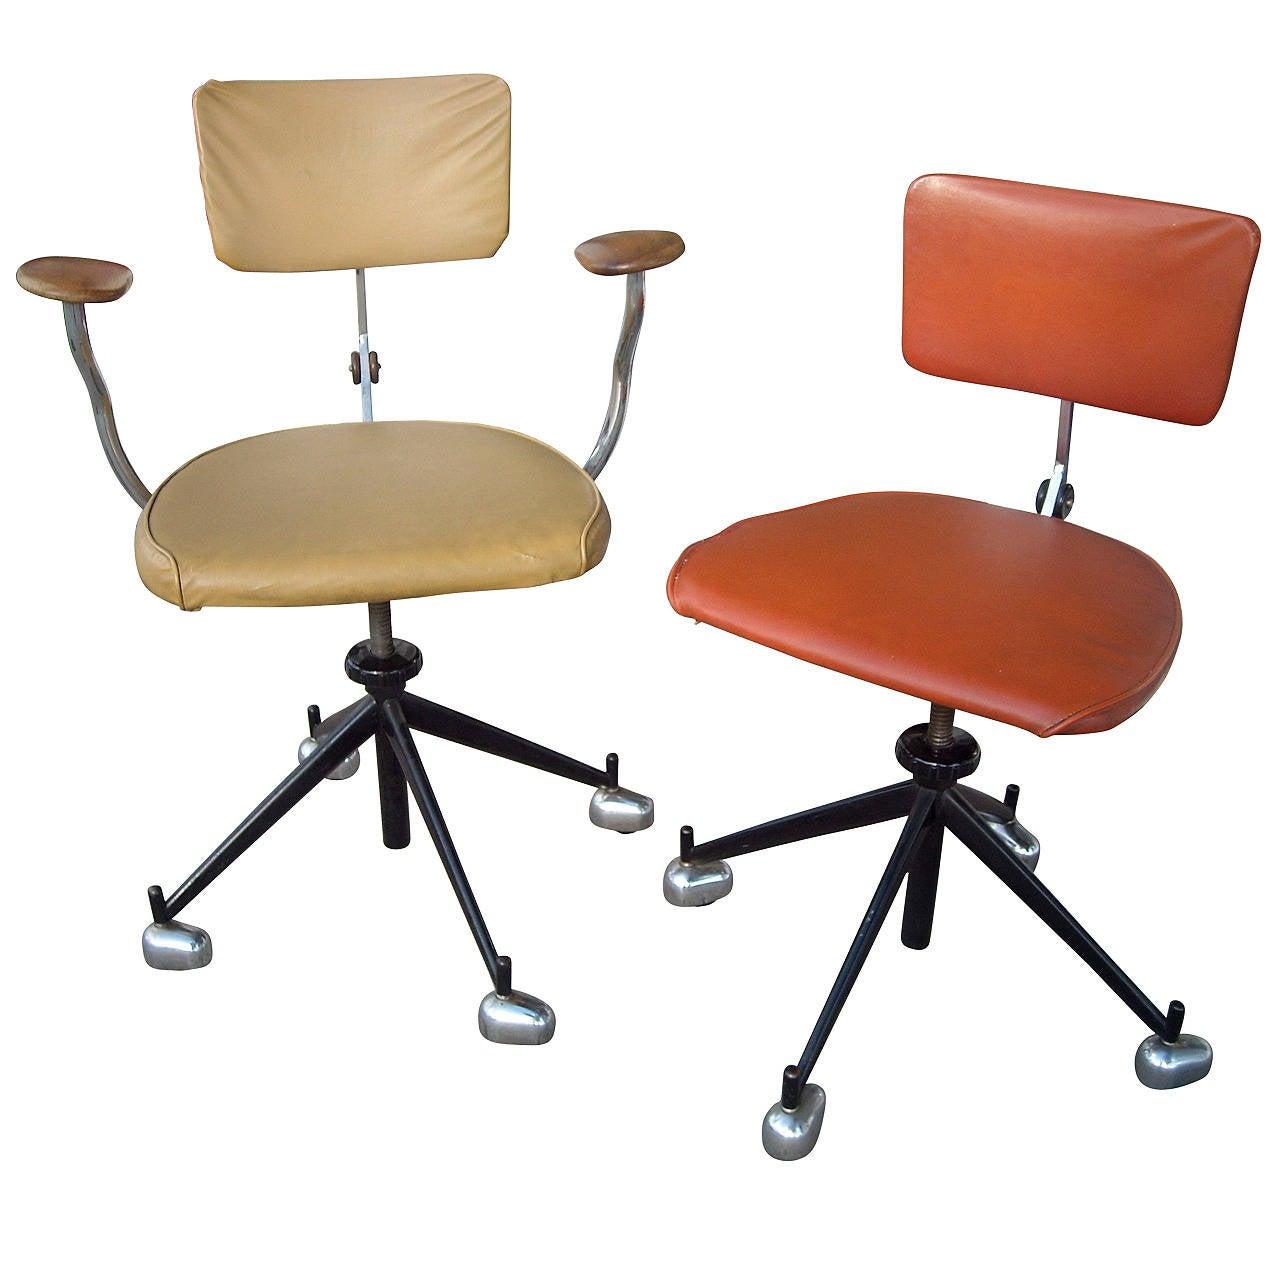 Jørgen Rasmussen Two Industrial Modern Kevi Office or Desk Chairs, Adjustable